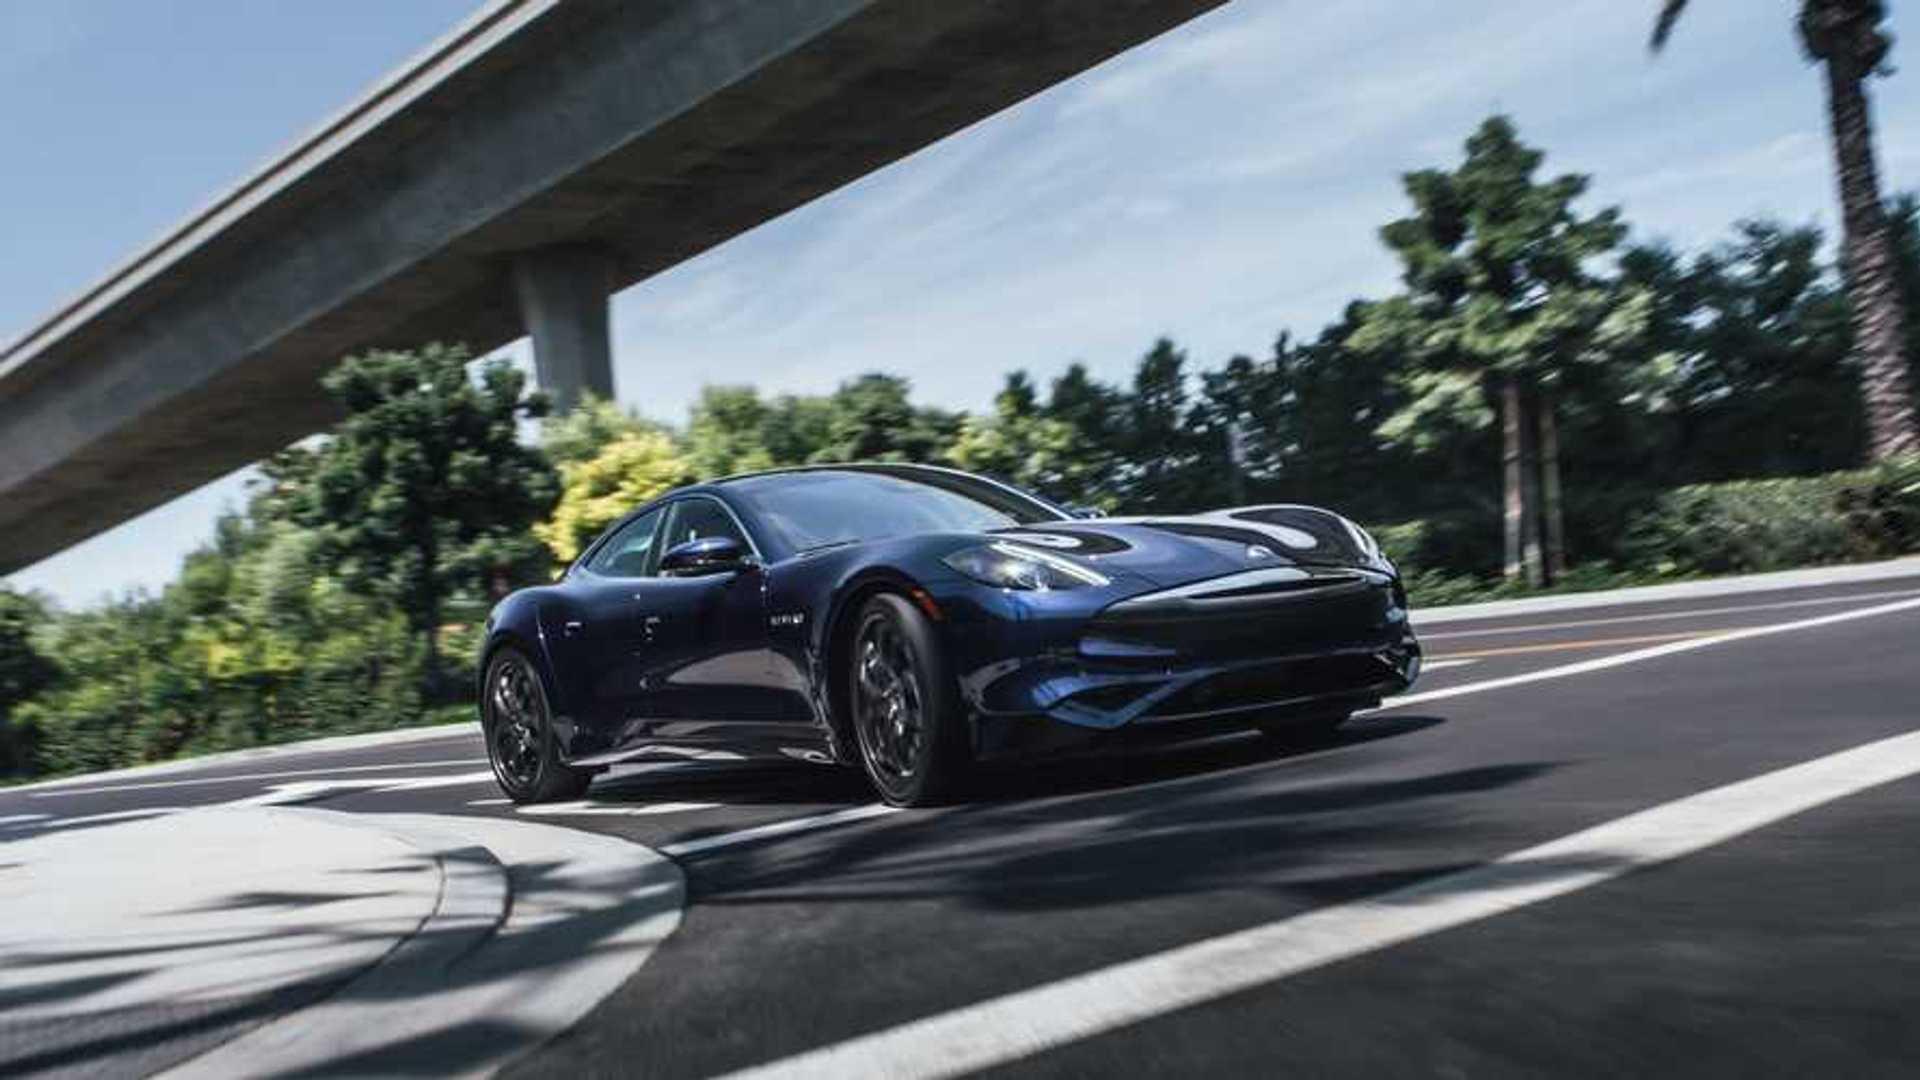 2020 Karma Revero GT Starts From $135,000